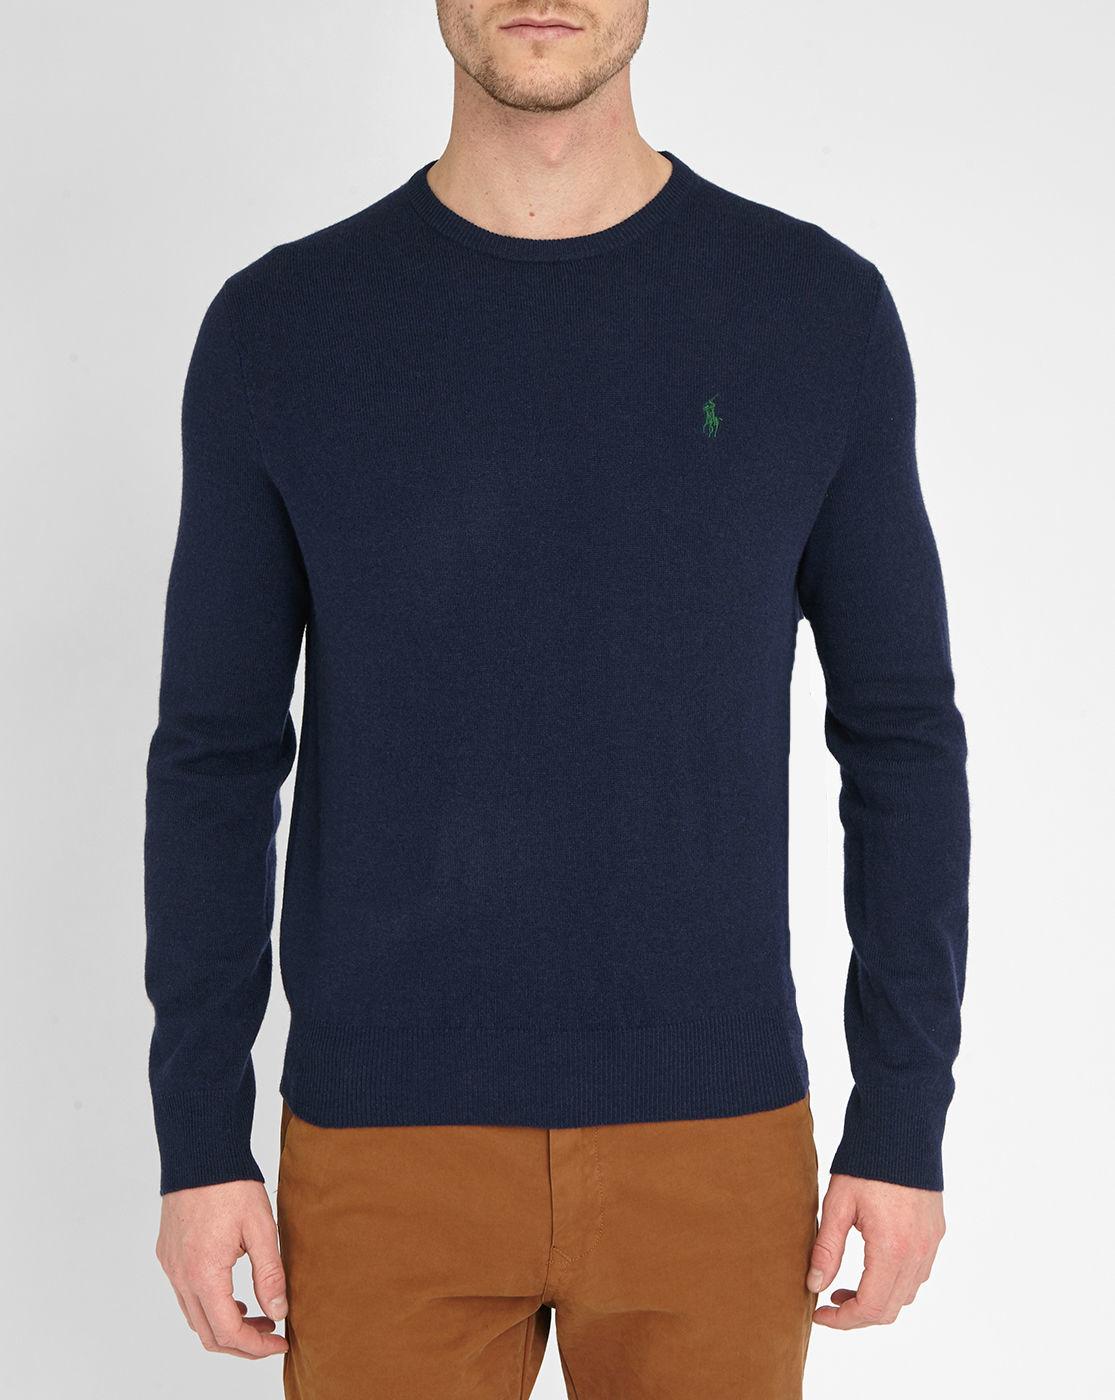 polo ralph lauren navy pr merino wool sweater in blue for men lyst. Black Bedroom Furniture Sets. Home Design Ideas